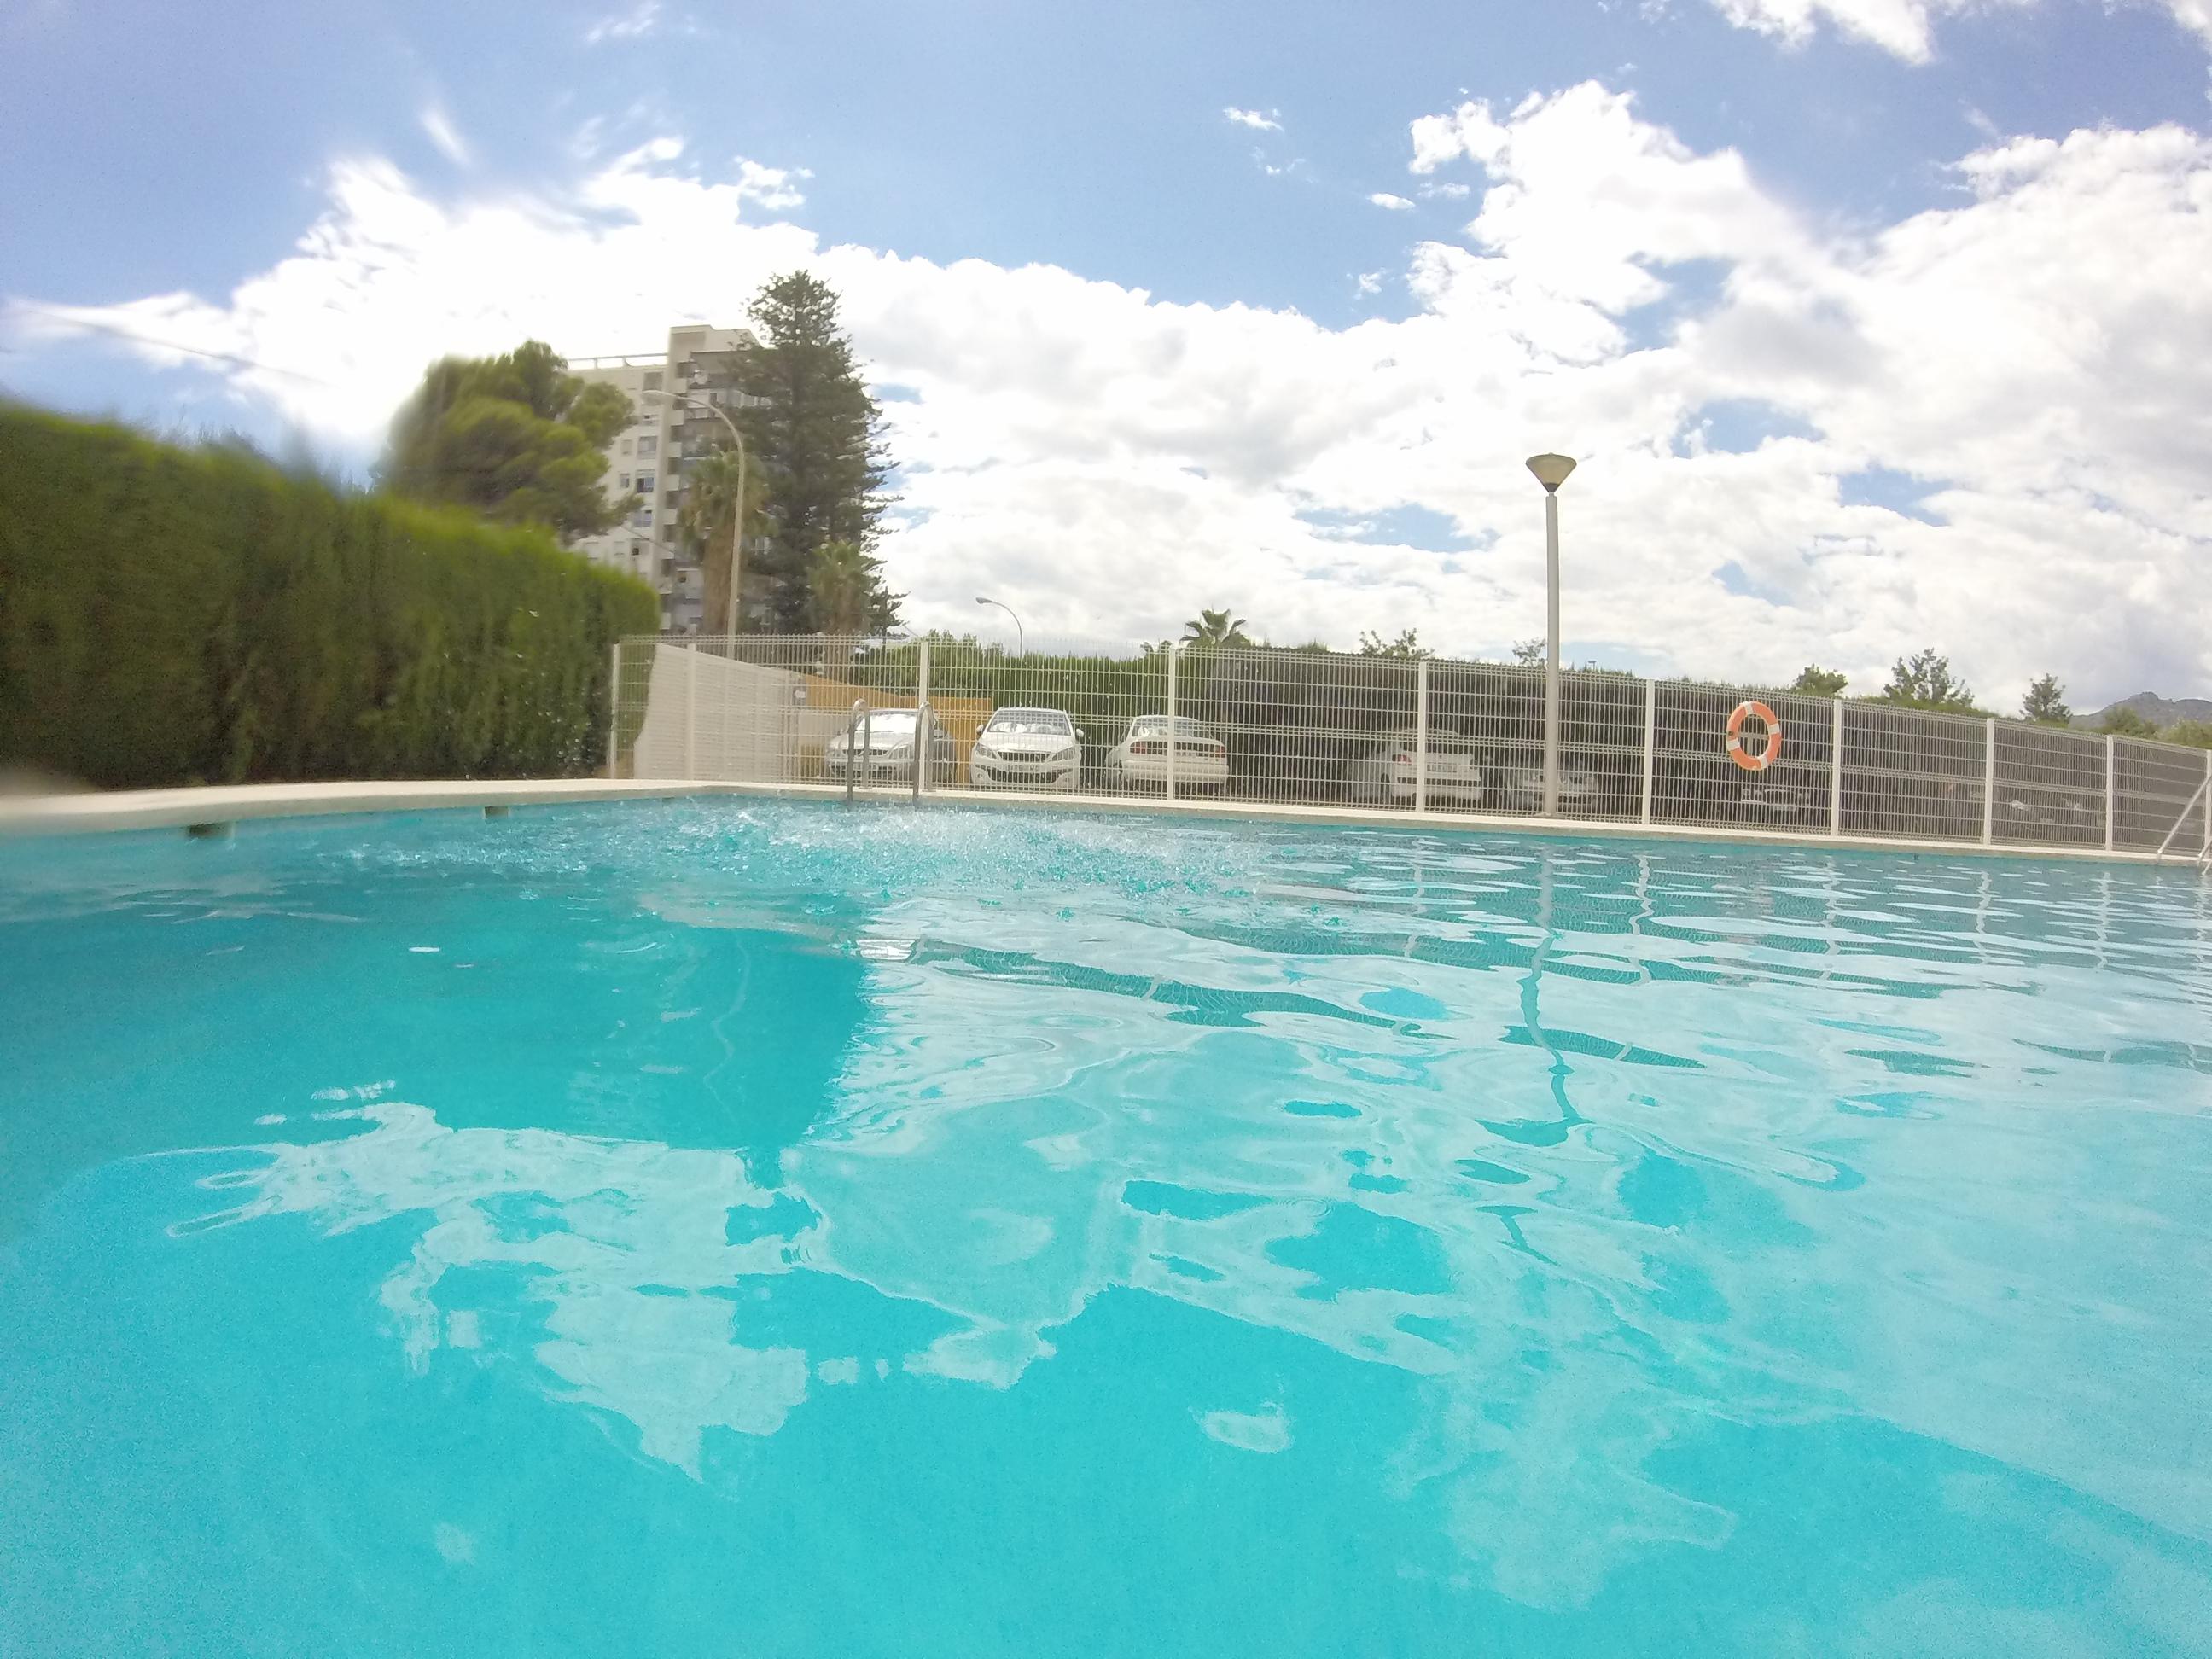 Piscinas agua salada i esarquitectos for Deycon piscinas sa